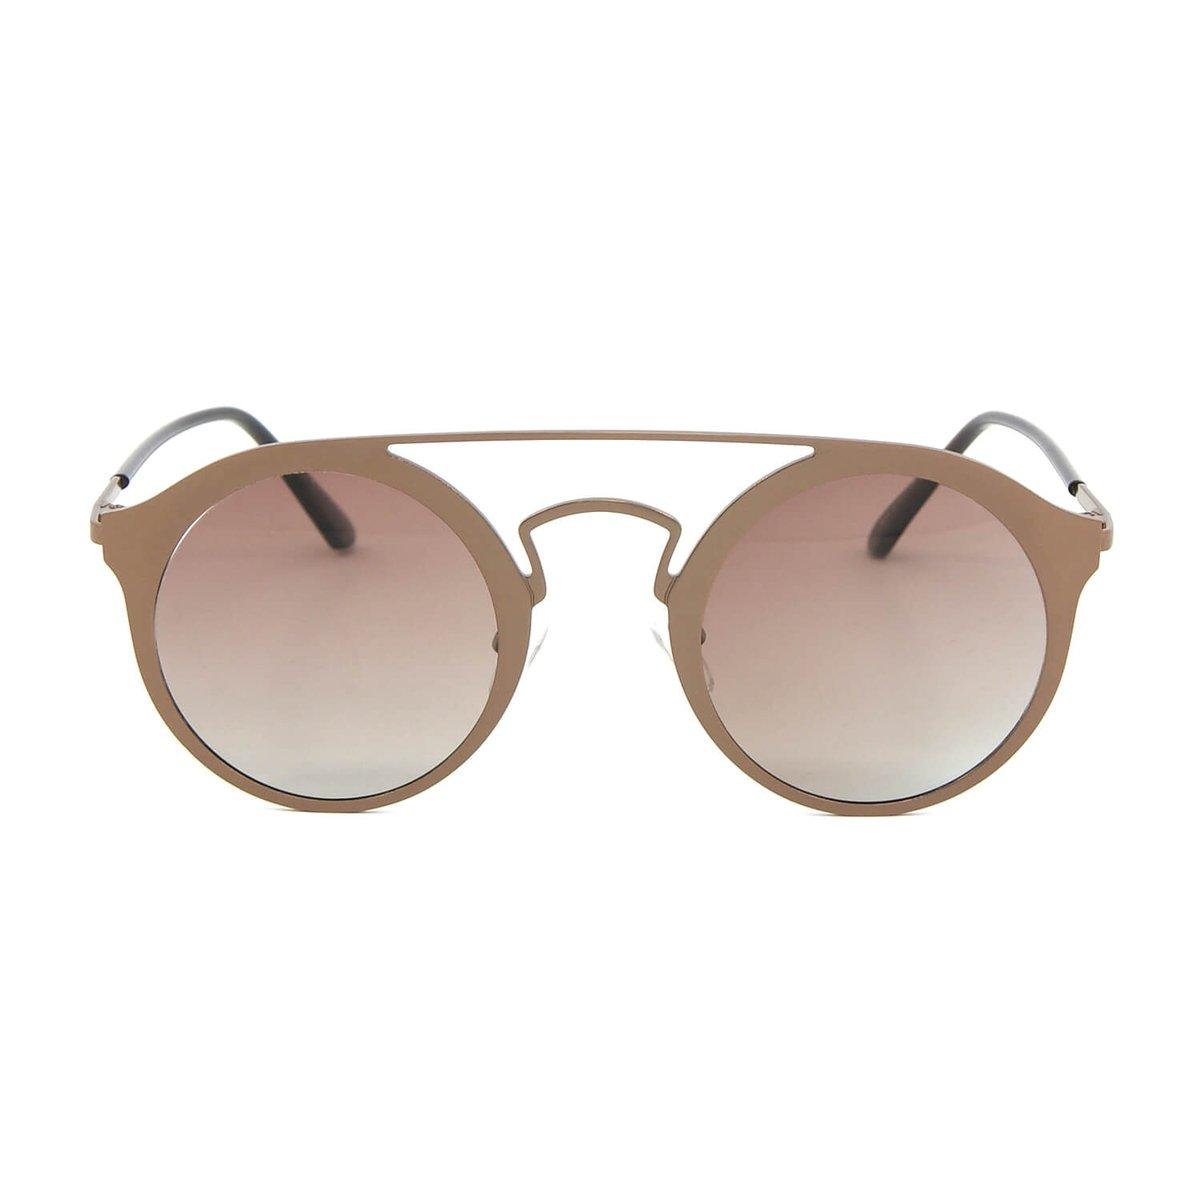 cbe2a882046fc Óculos de Sol Estilo Top Bar Redondo - Marrom - Compre Agora   Zattini